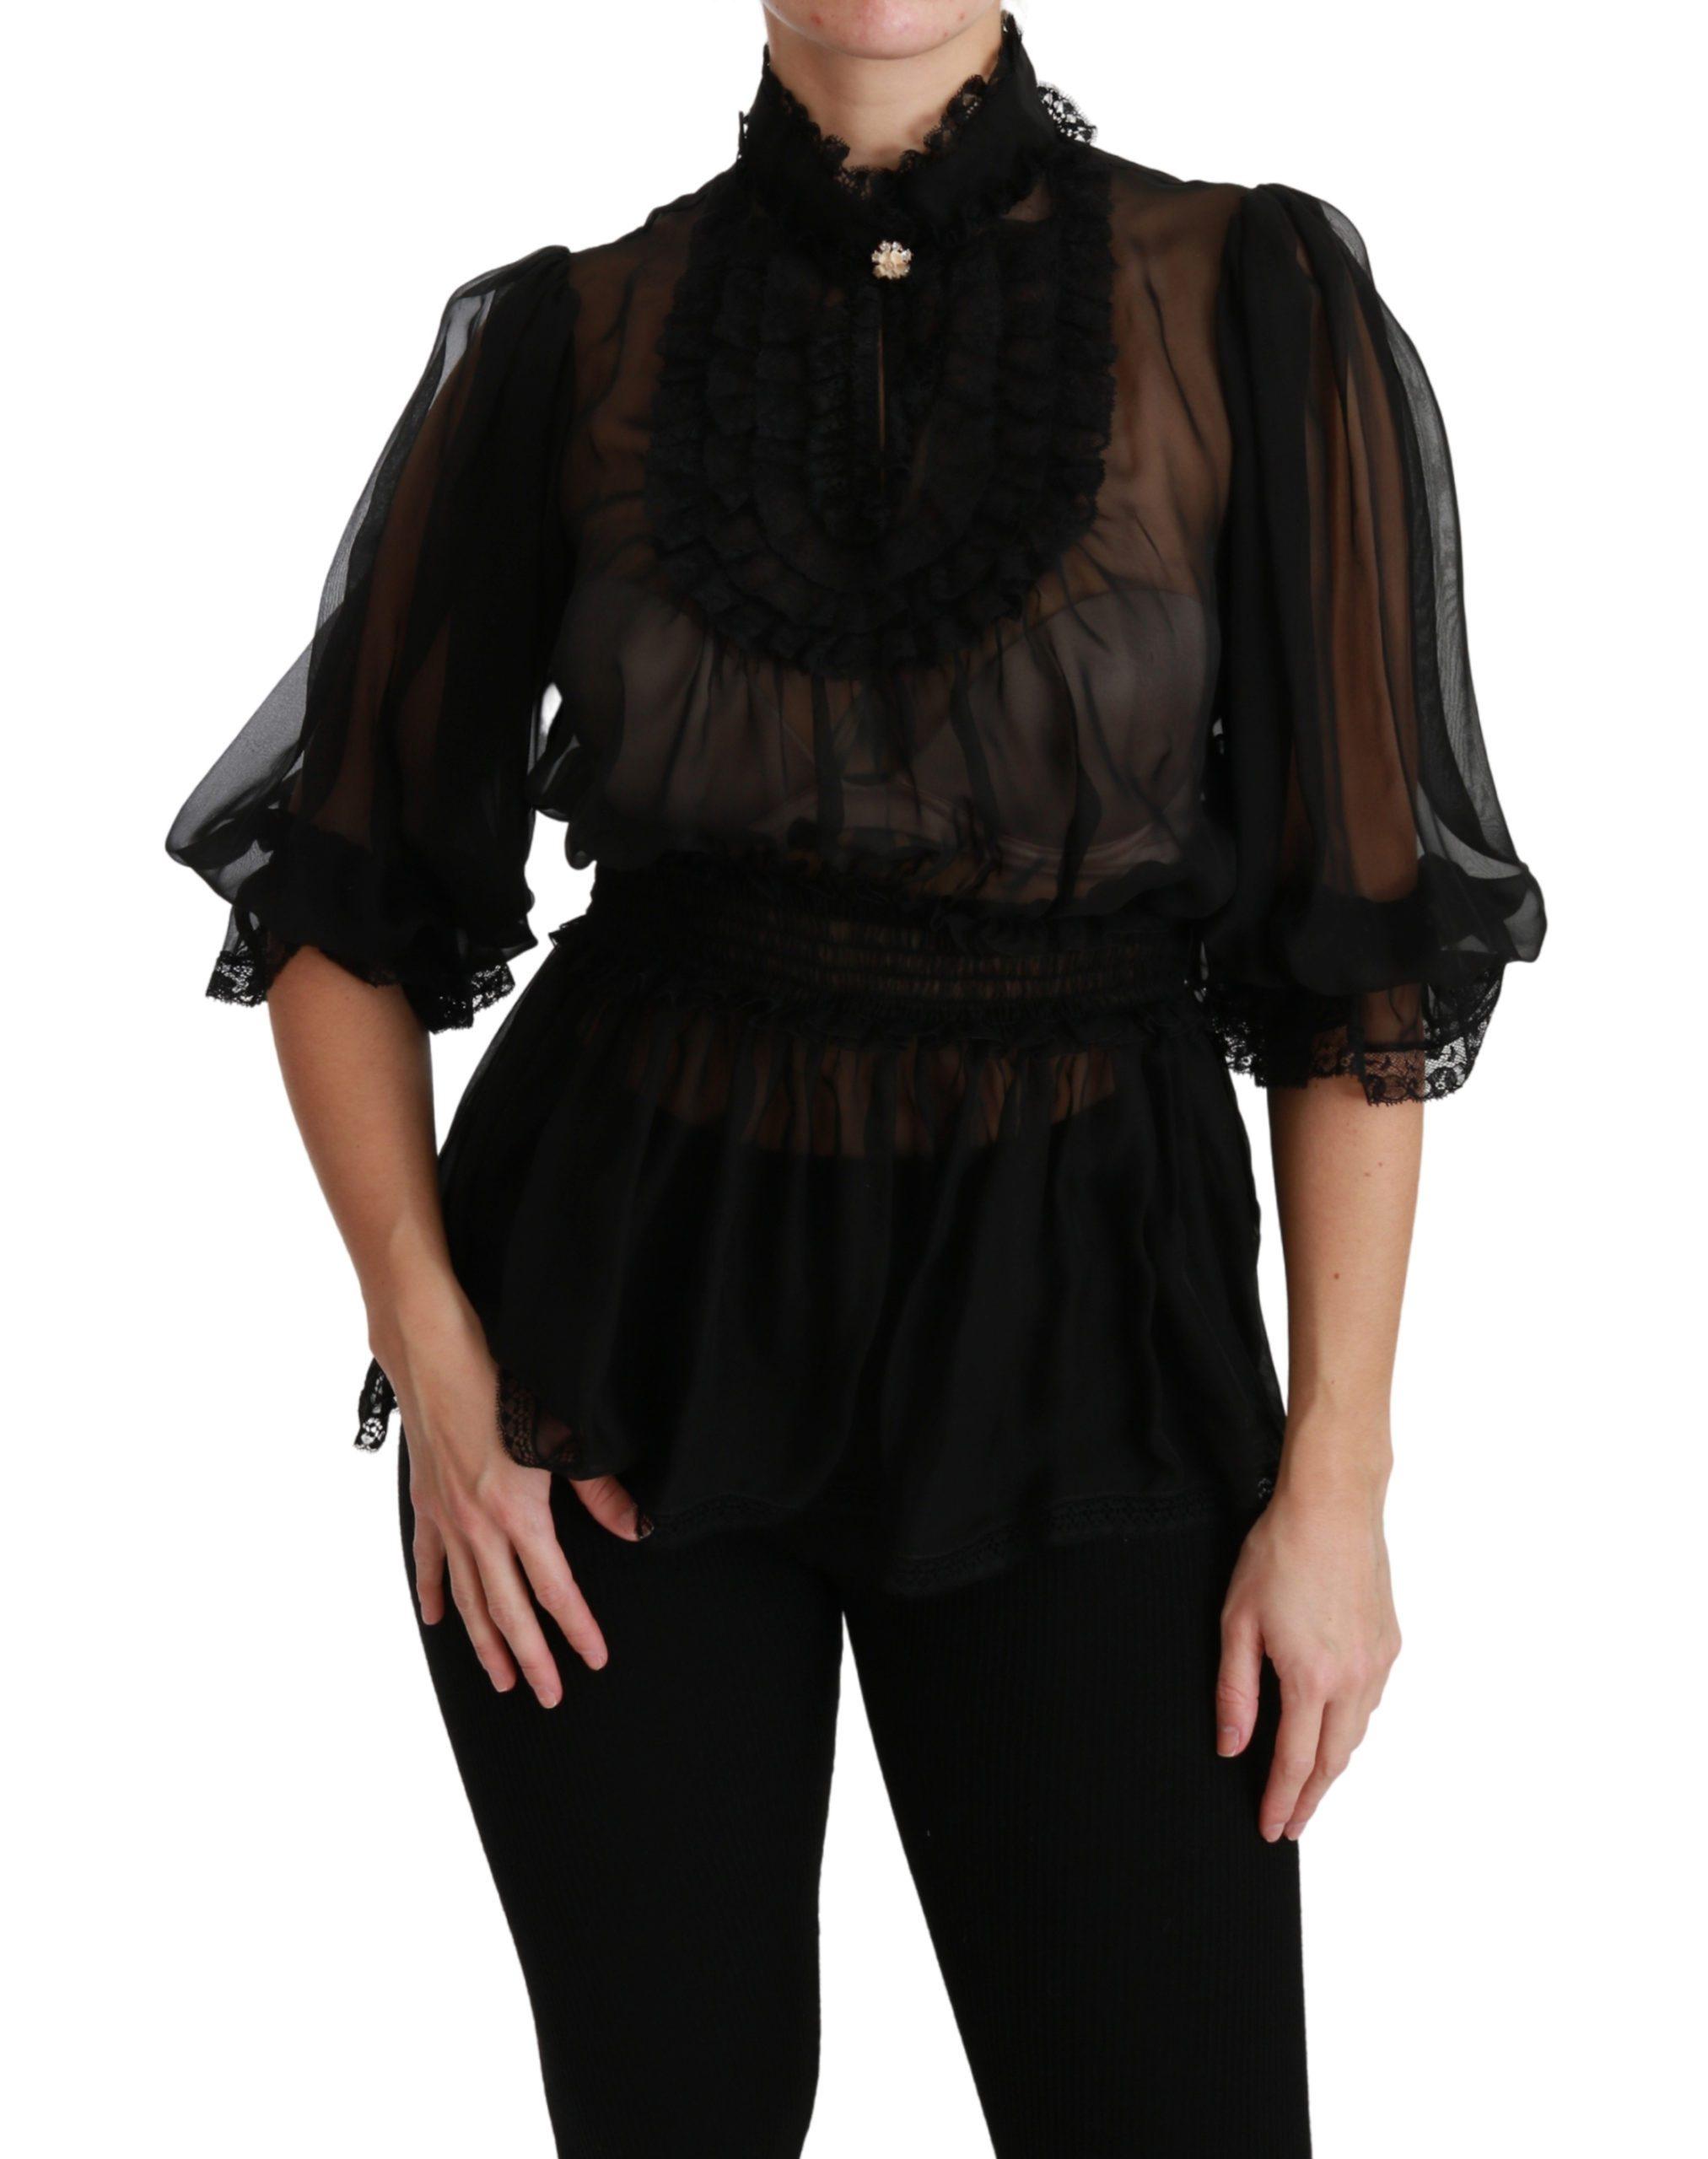 Dolce & Gabbana Women's Ruffle Shear Silk Top Black TSH4497 - IT40|S